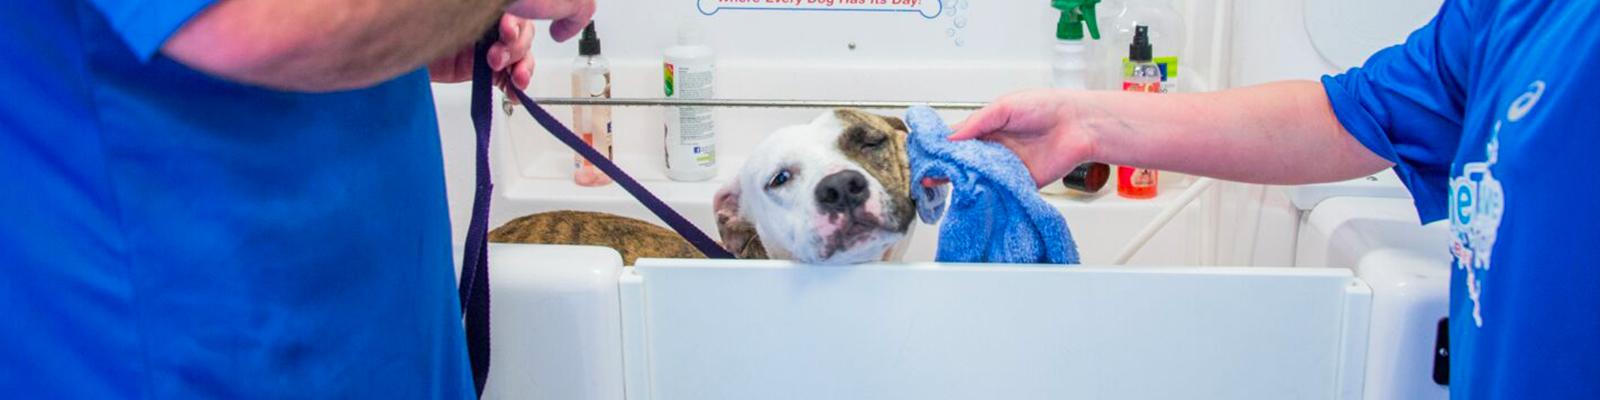 Hydrodog Mobile Dog Grooming Washing Service Hero Image